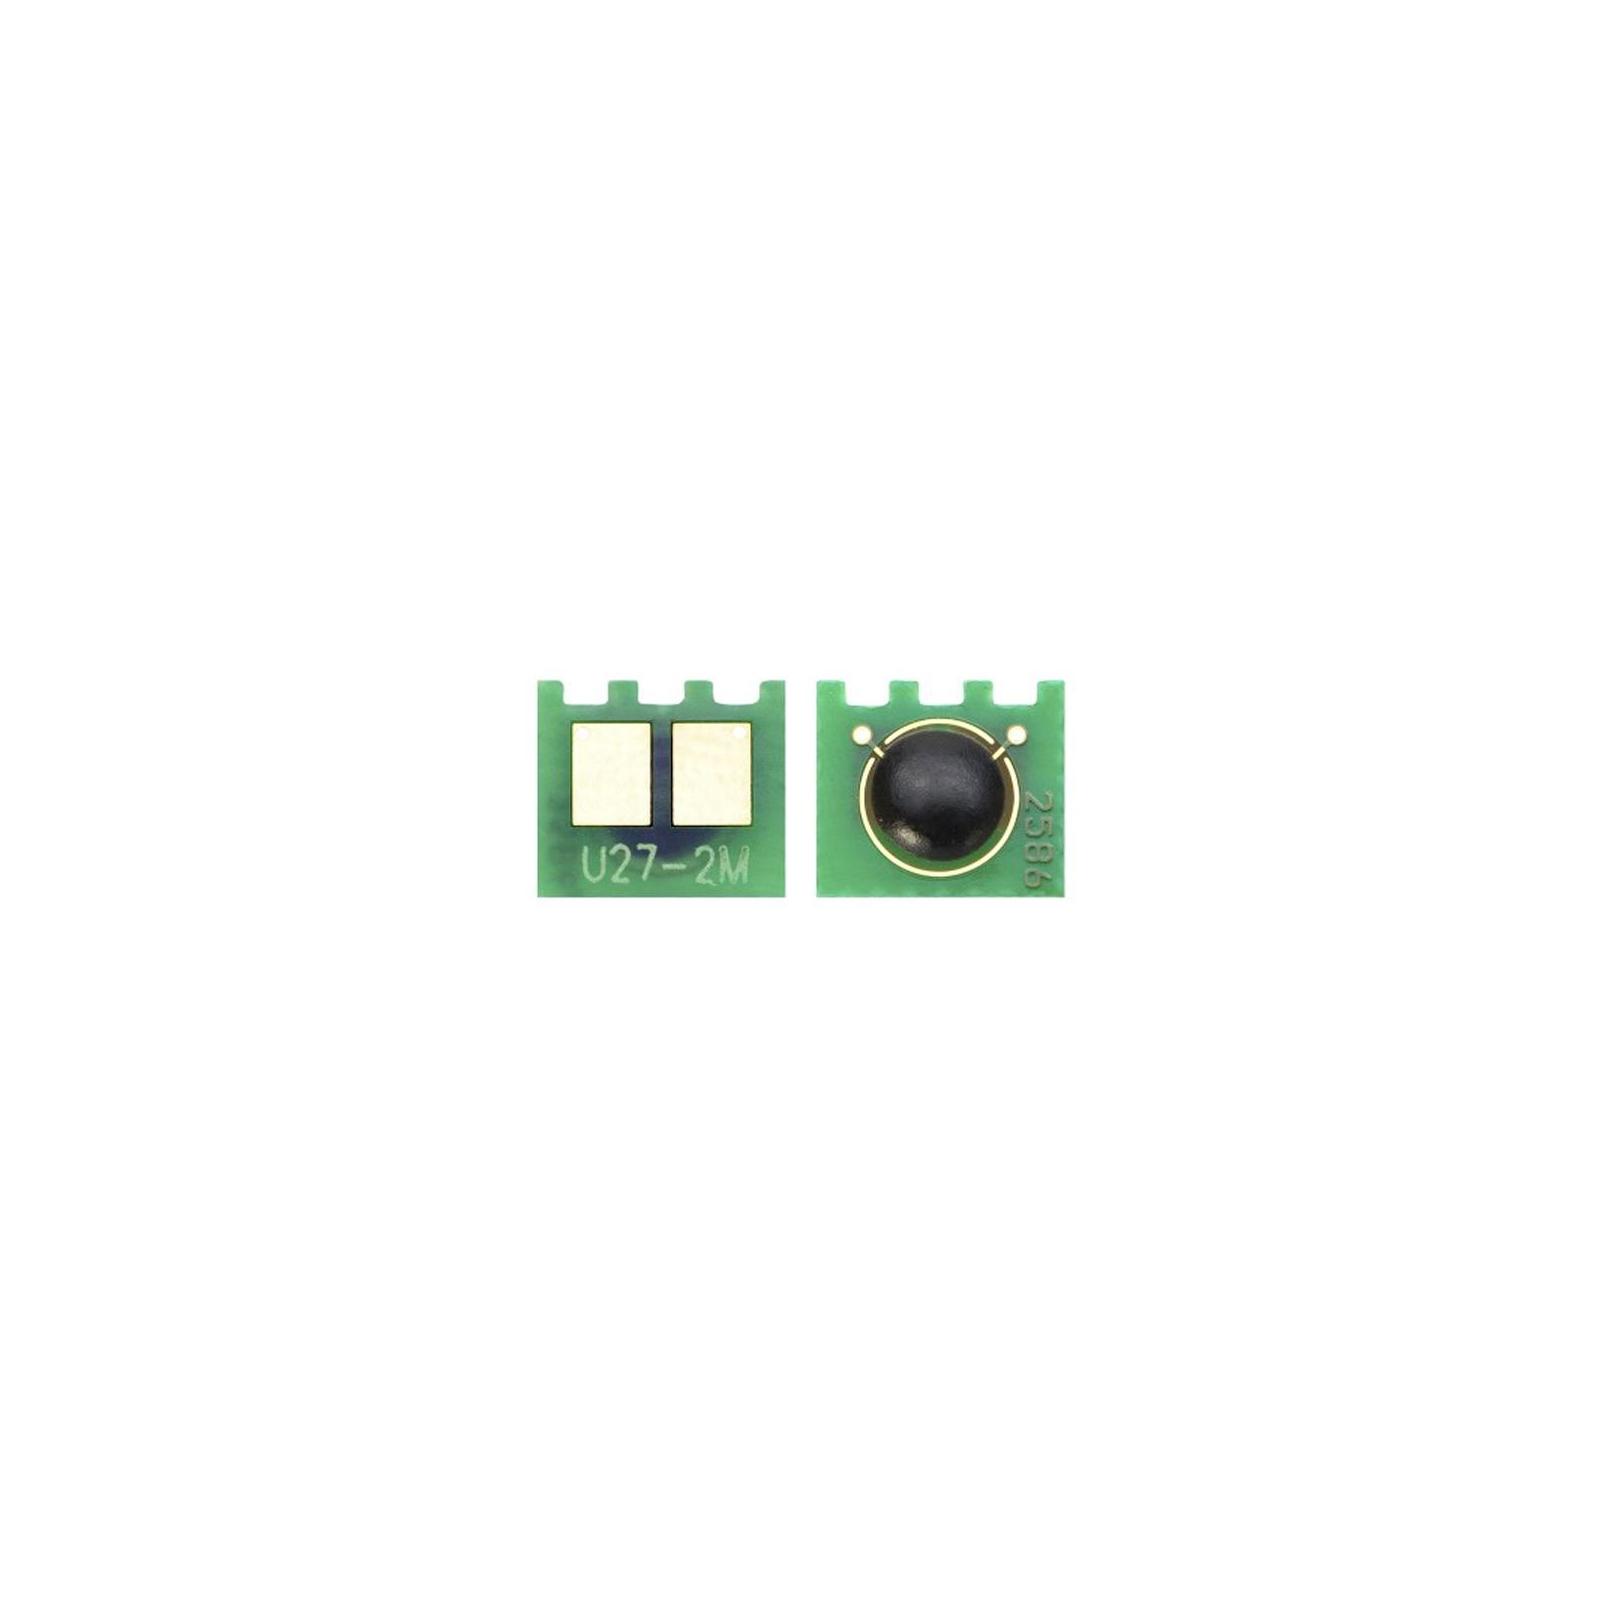 Чип для картриджа HP CLJ CP2025, Canon 716/718 magenta Static Control (U27-2CHIP-MA)